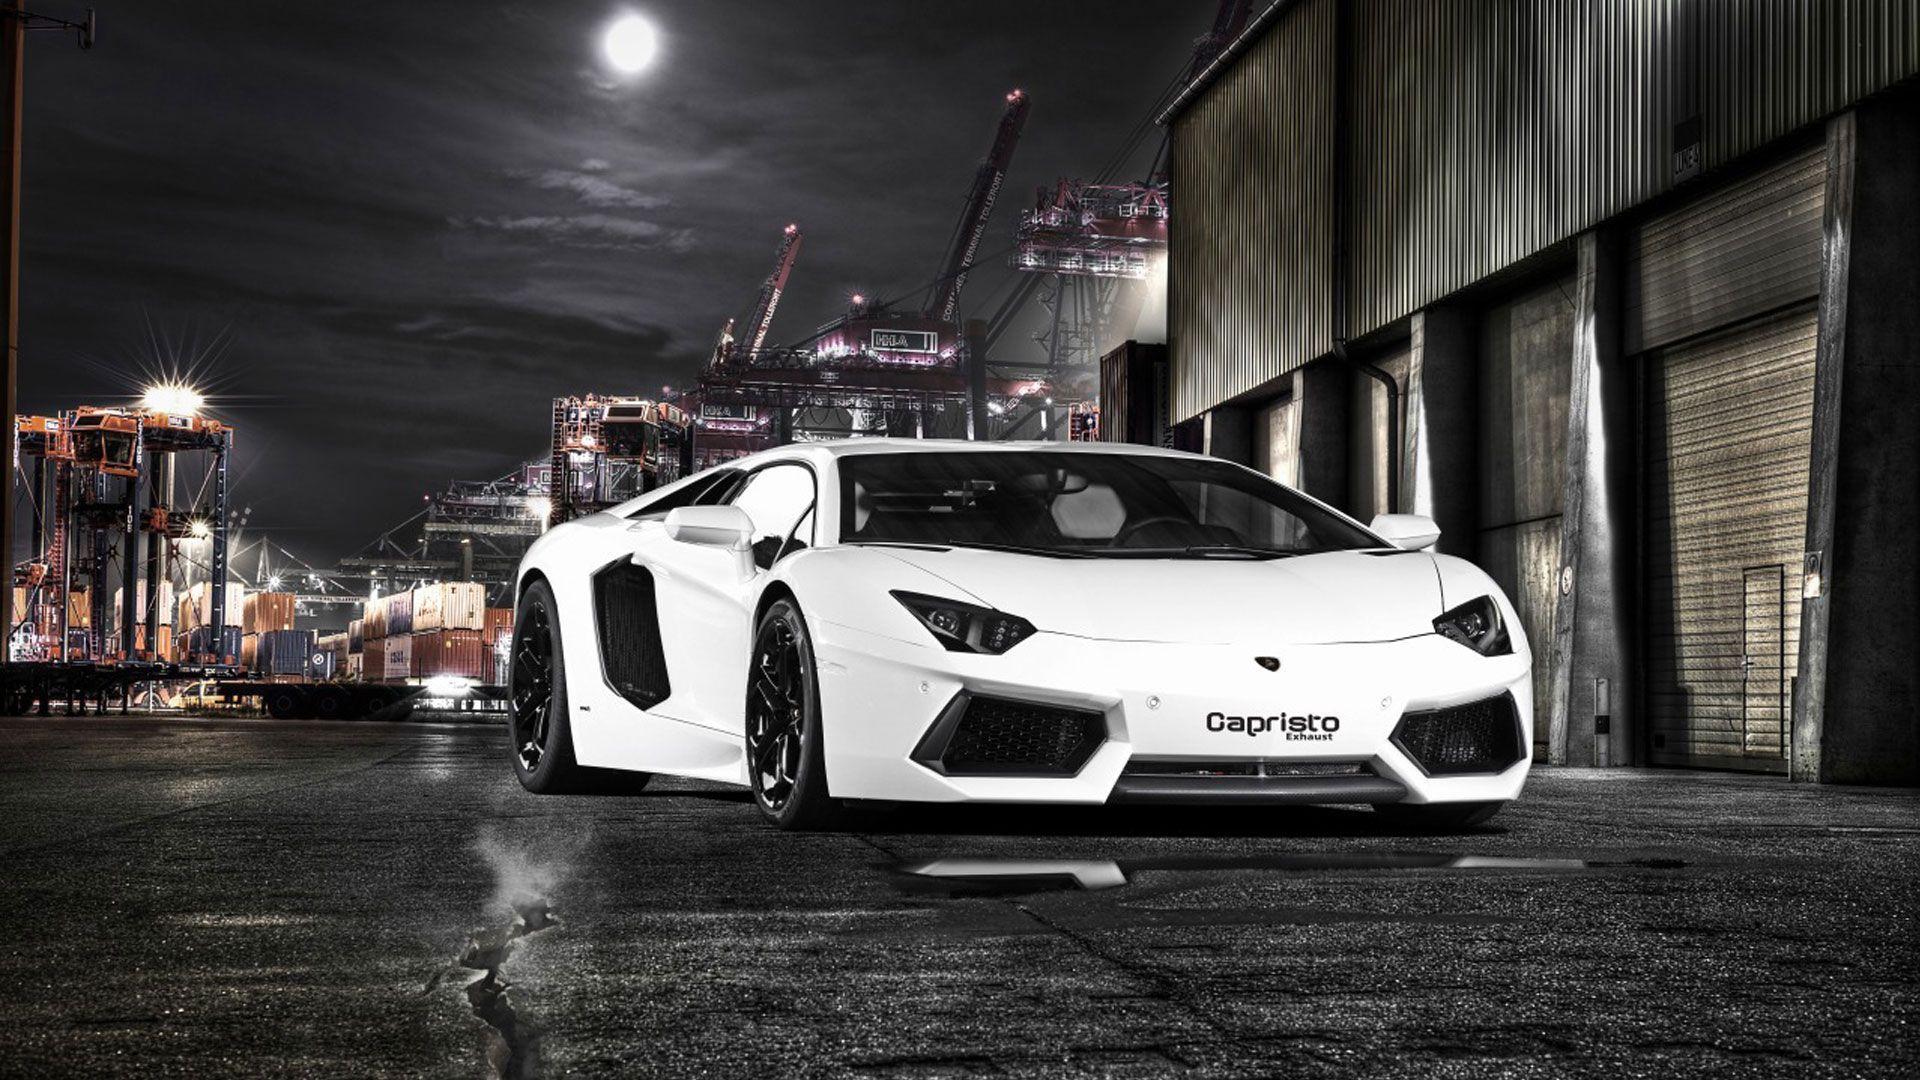 Ultra Hd K Lamborghini Wallpapers Hd Desktop Backgrounds 1920x1080